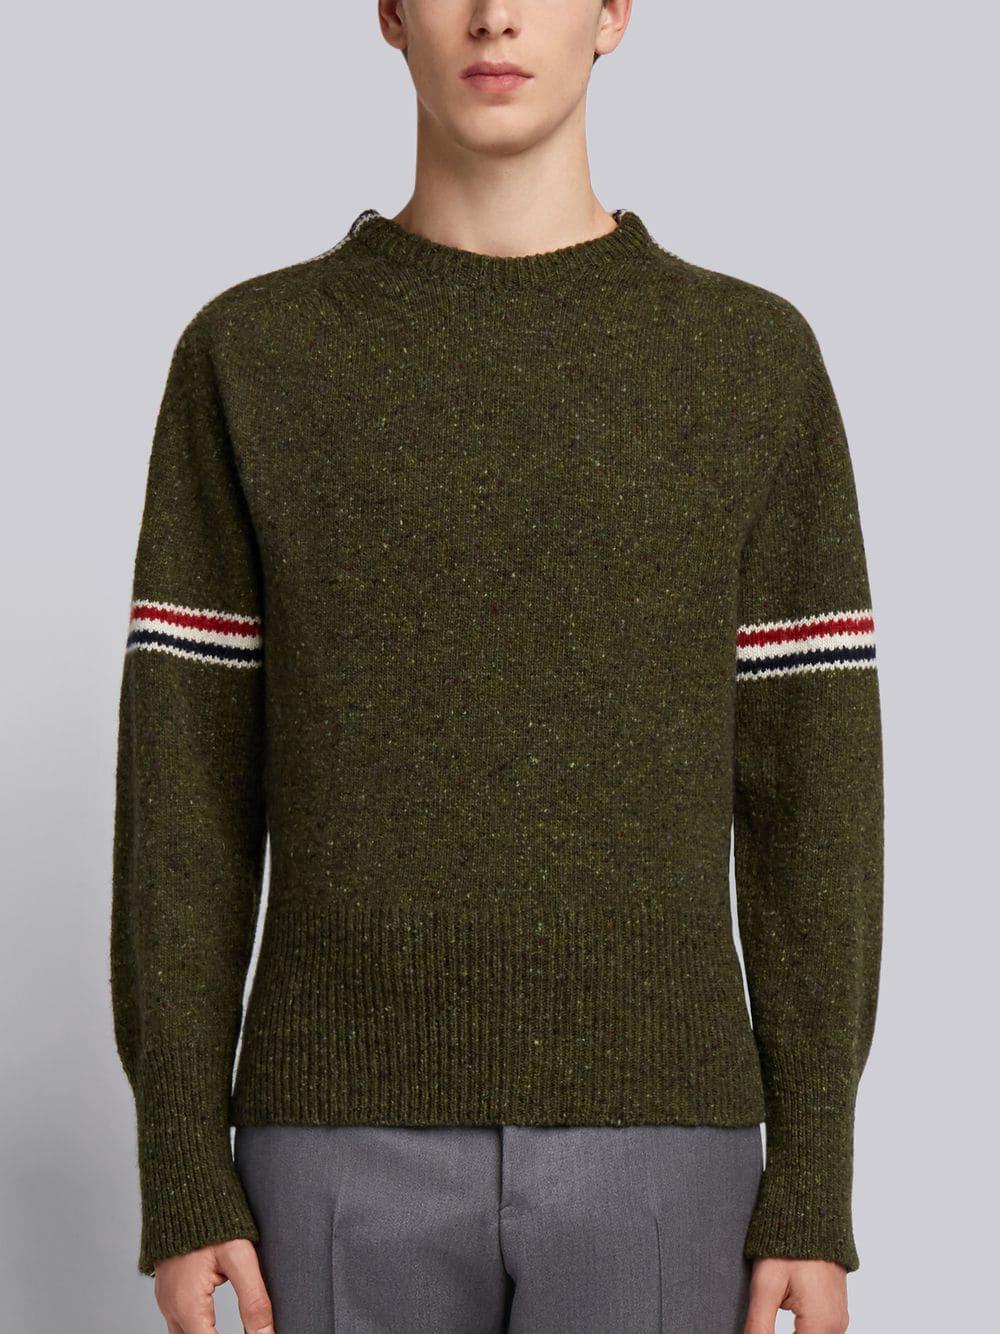 Thom Browne Rwb Intarsia Armband Tweed Pullover In Green